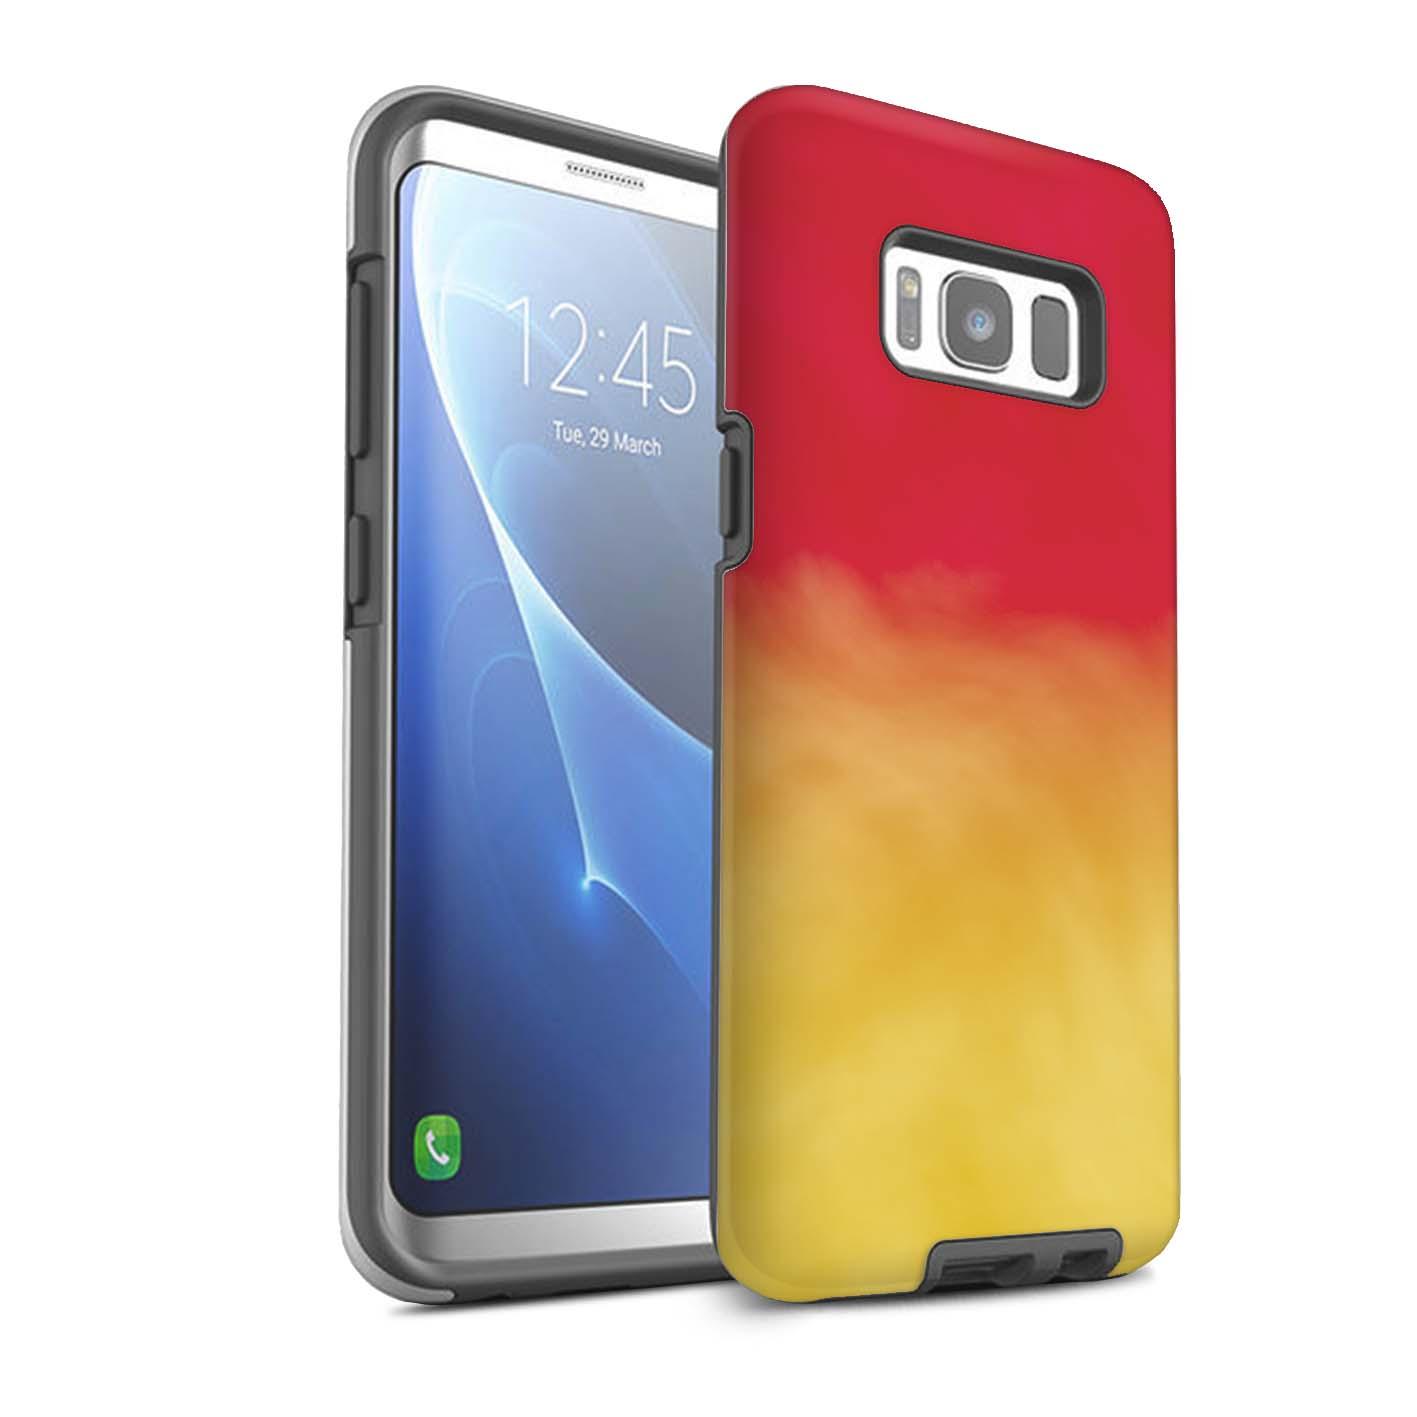 Robuste-Matte-Antichoc-Etui-STUFF4-pour-Samsung-Galaxy-S8-G950-Ombre-Mode